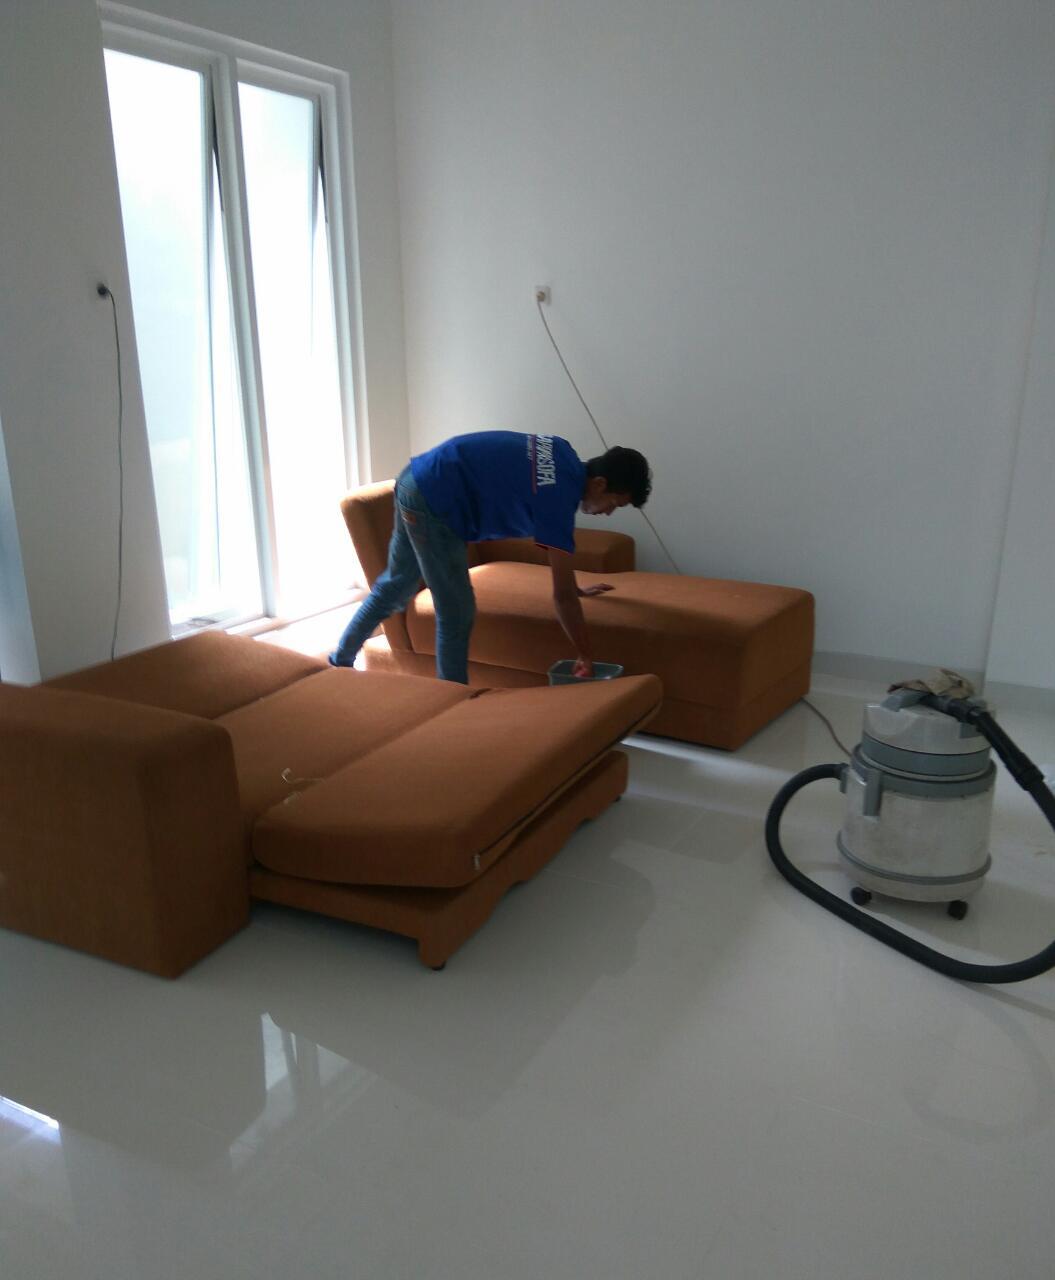 Jasa Cuci Sofa Bekasi Timur Paling Murah dan Bergaransi 085103457745: Layanan cuci sofa bekasi selatan tersedia pada wilayah: Cuci Sofa Aren Jaya, Bekasi Jaya, Duren Jaya, dan Cuci Sofa Margahayu.